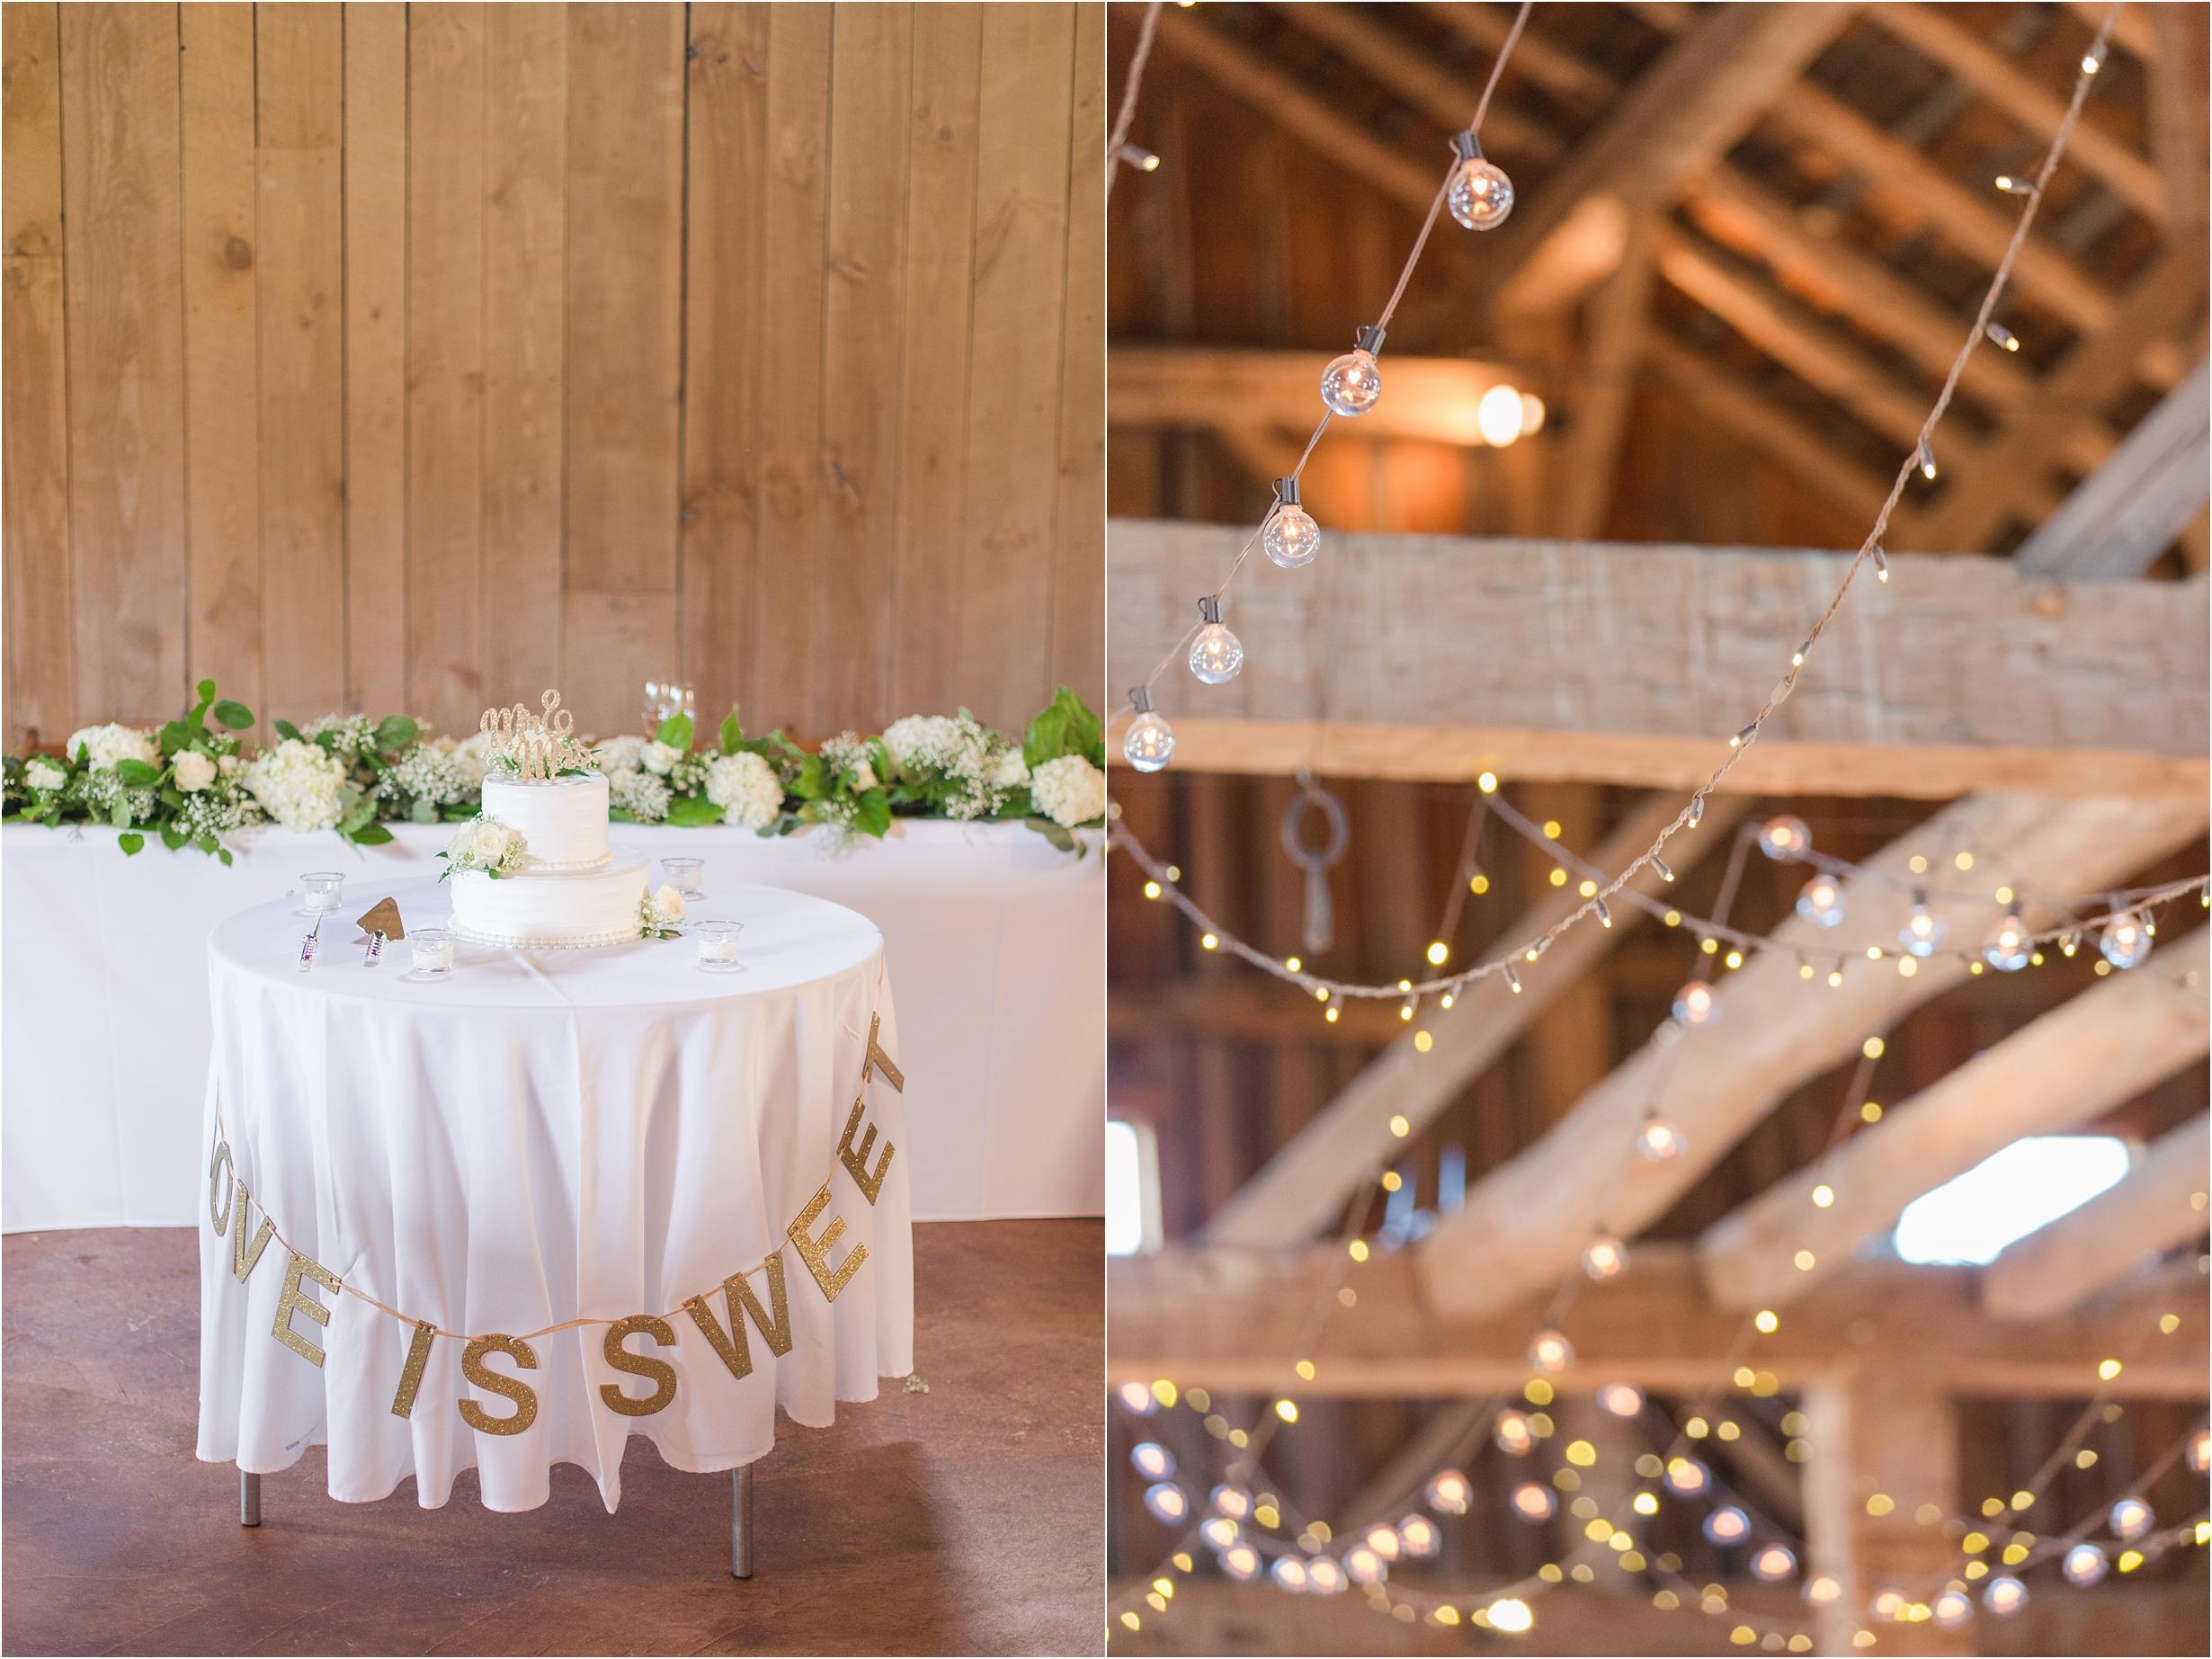 romantic-timeless-candid-wedding-photos-at-the-valley-frutig-farms-in-ann-arbor-mi-by-courtney-carolyn-photography_0006.jpg